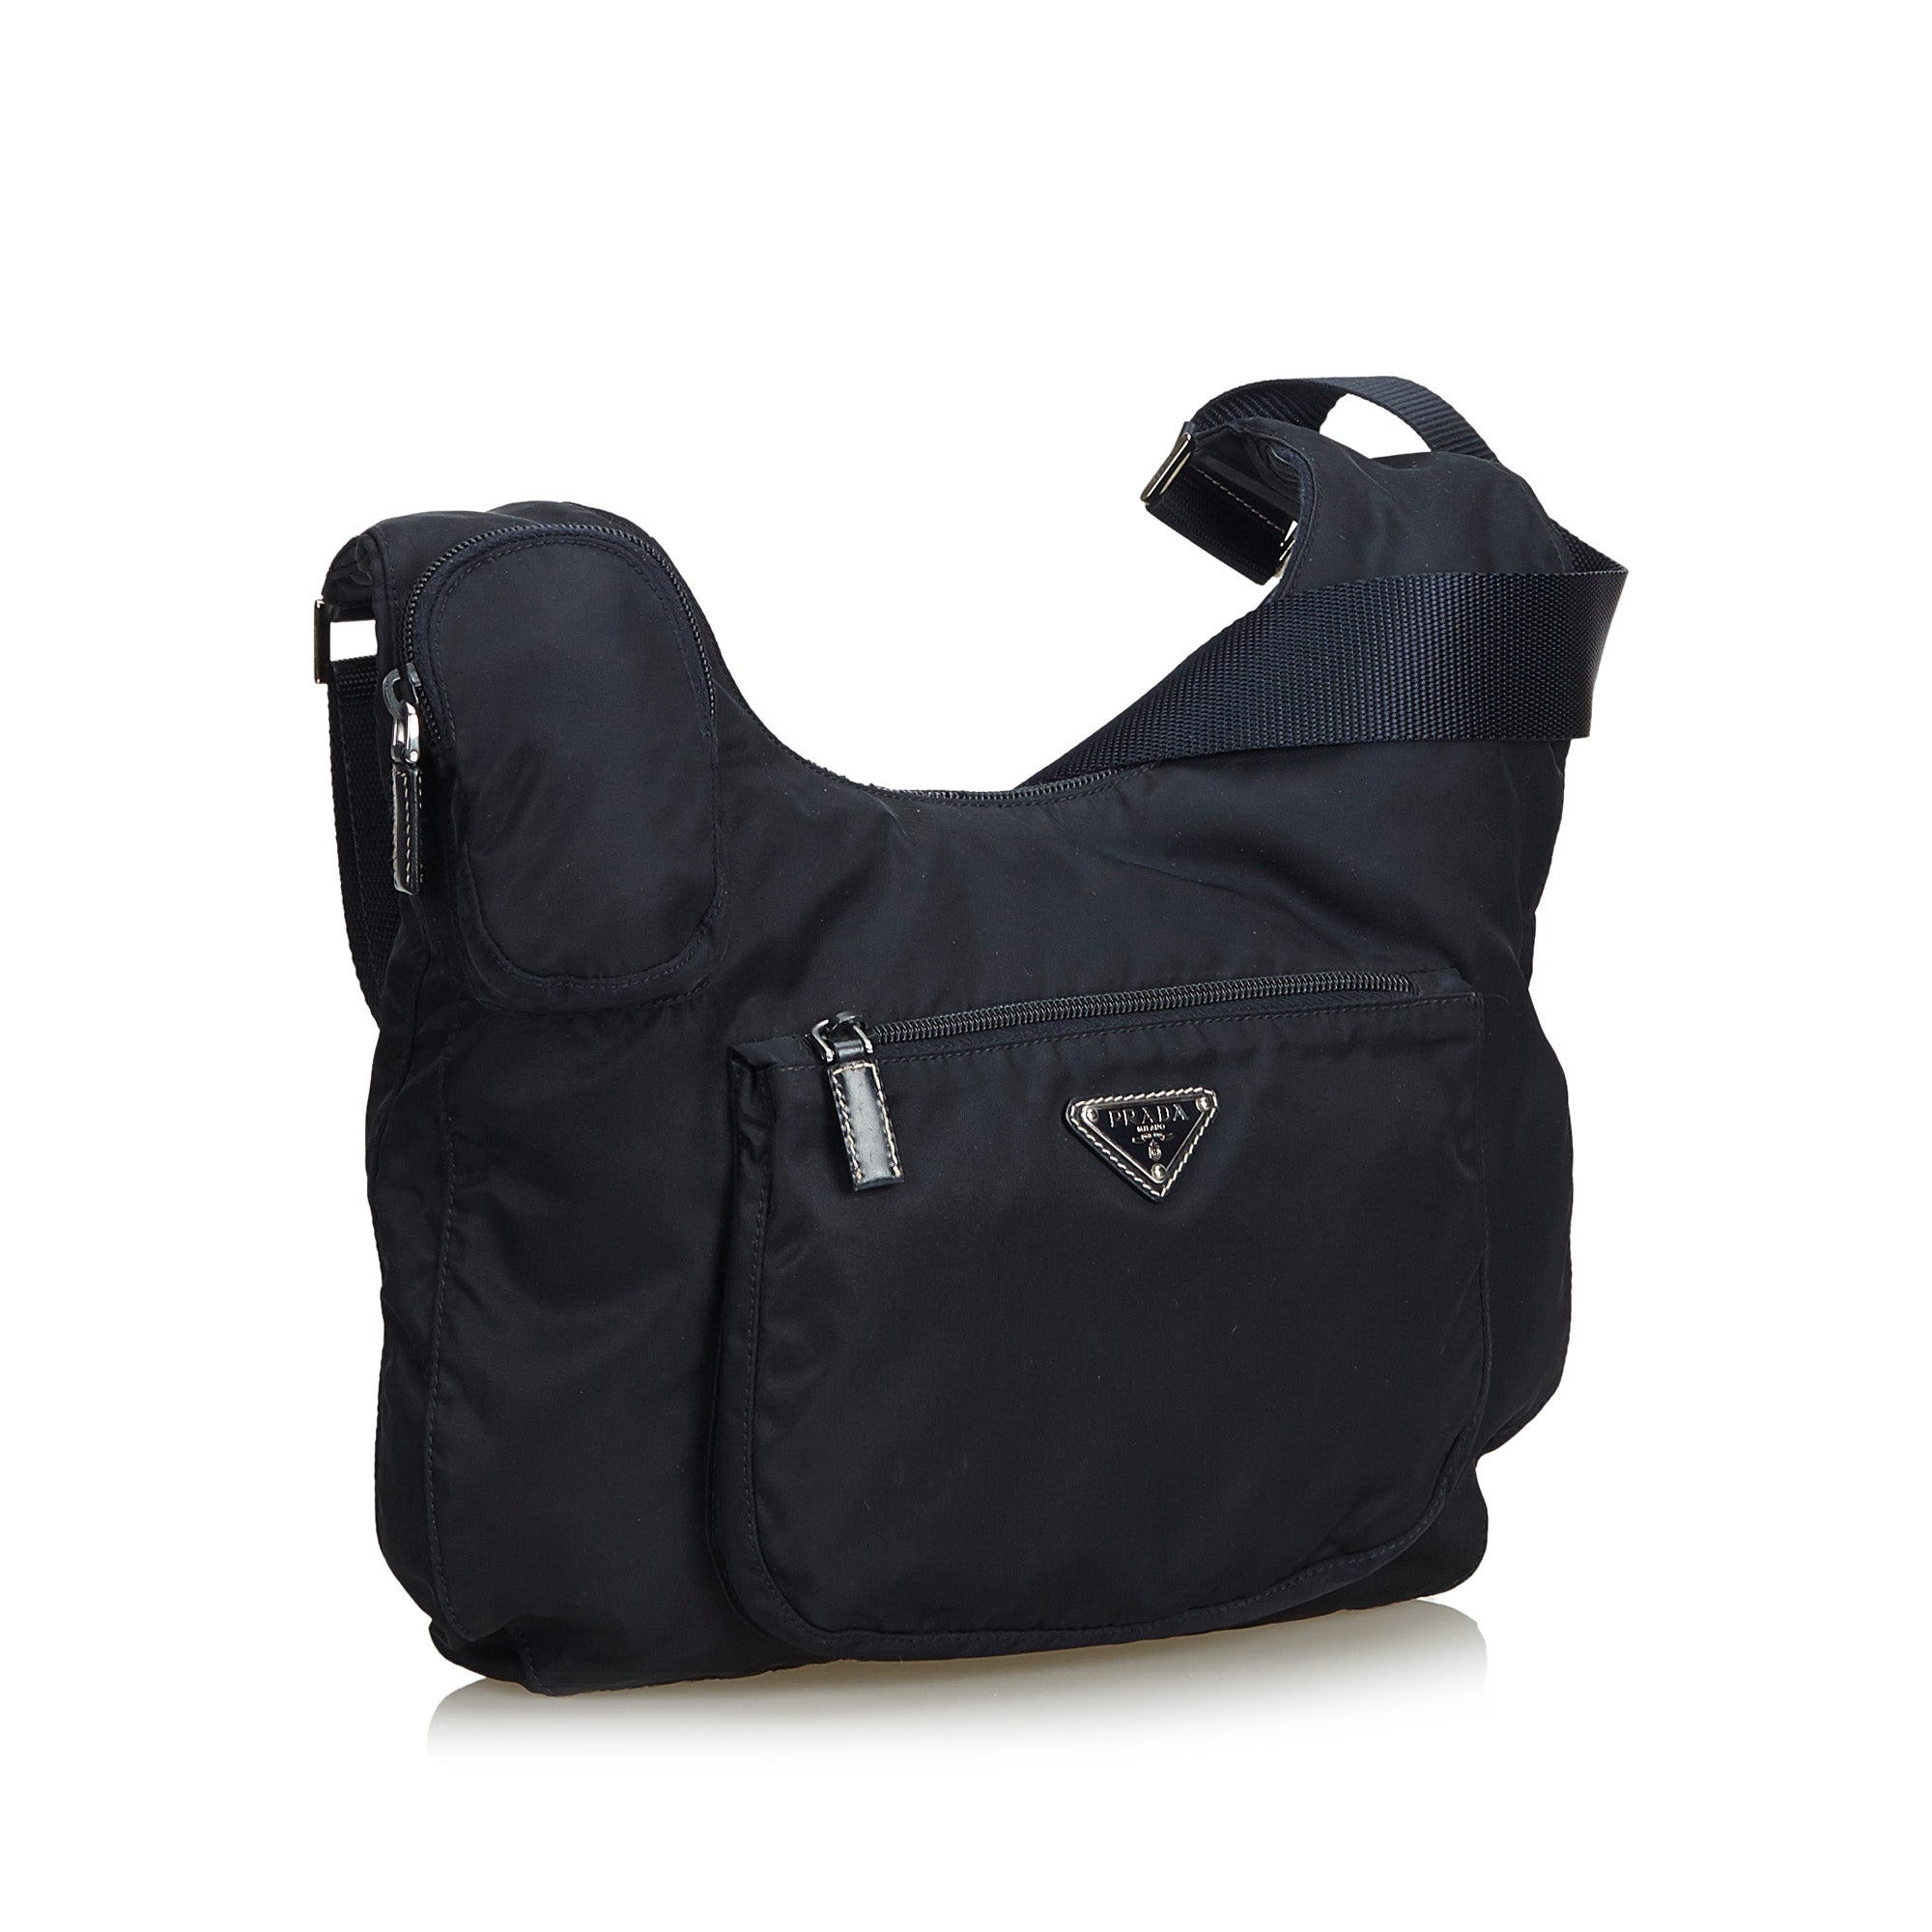 c16952a9f7b435 Prada Black Nylon Crossbody Bag at 1stdibs